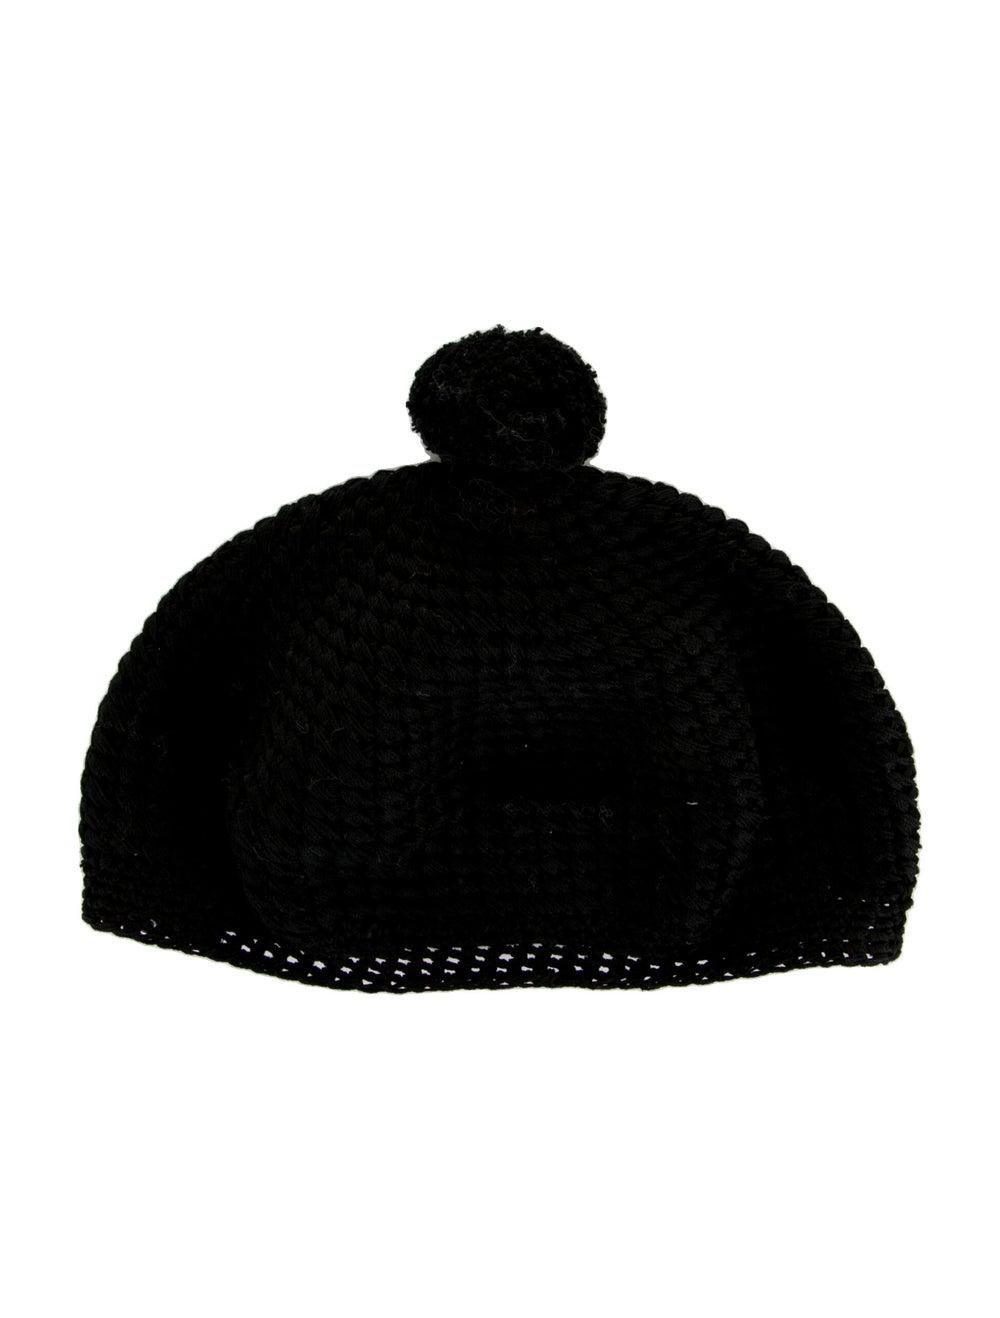 Gucci Knit Pom-Pom Beret Black - image 1